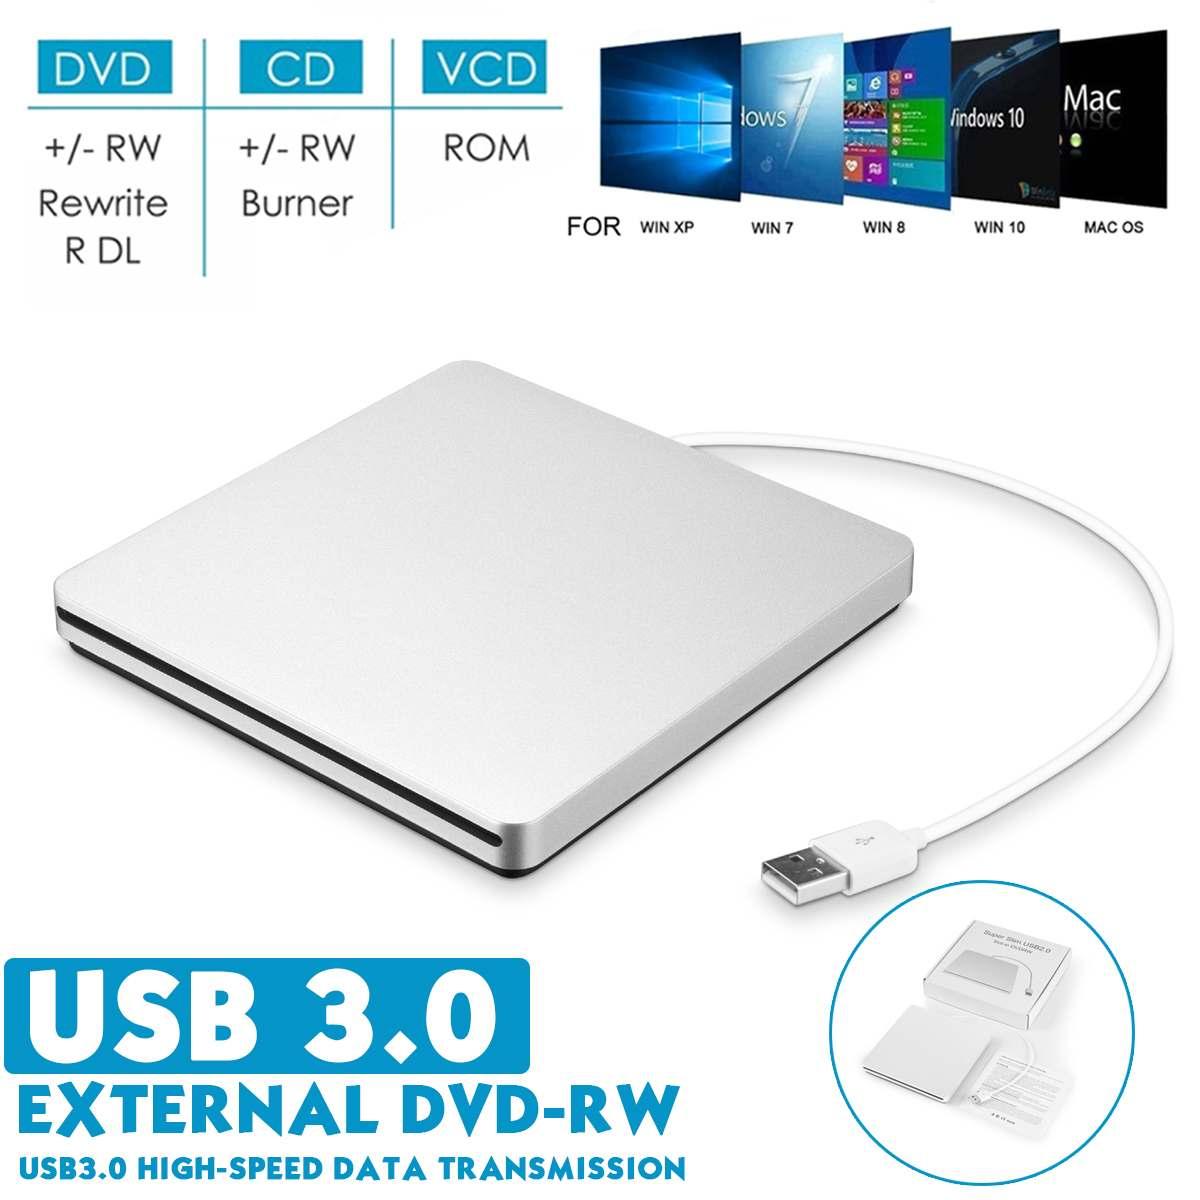 USB3.0 externa de CD/DVD Burner DVD-ROM óptico reproductor de disco carga ranura portátil para Windows 7/8/10 Mac Notebook conductor